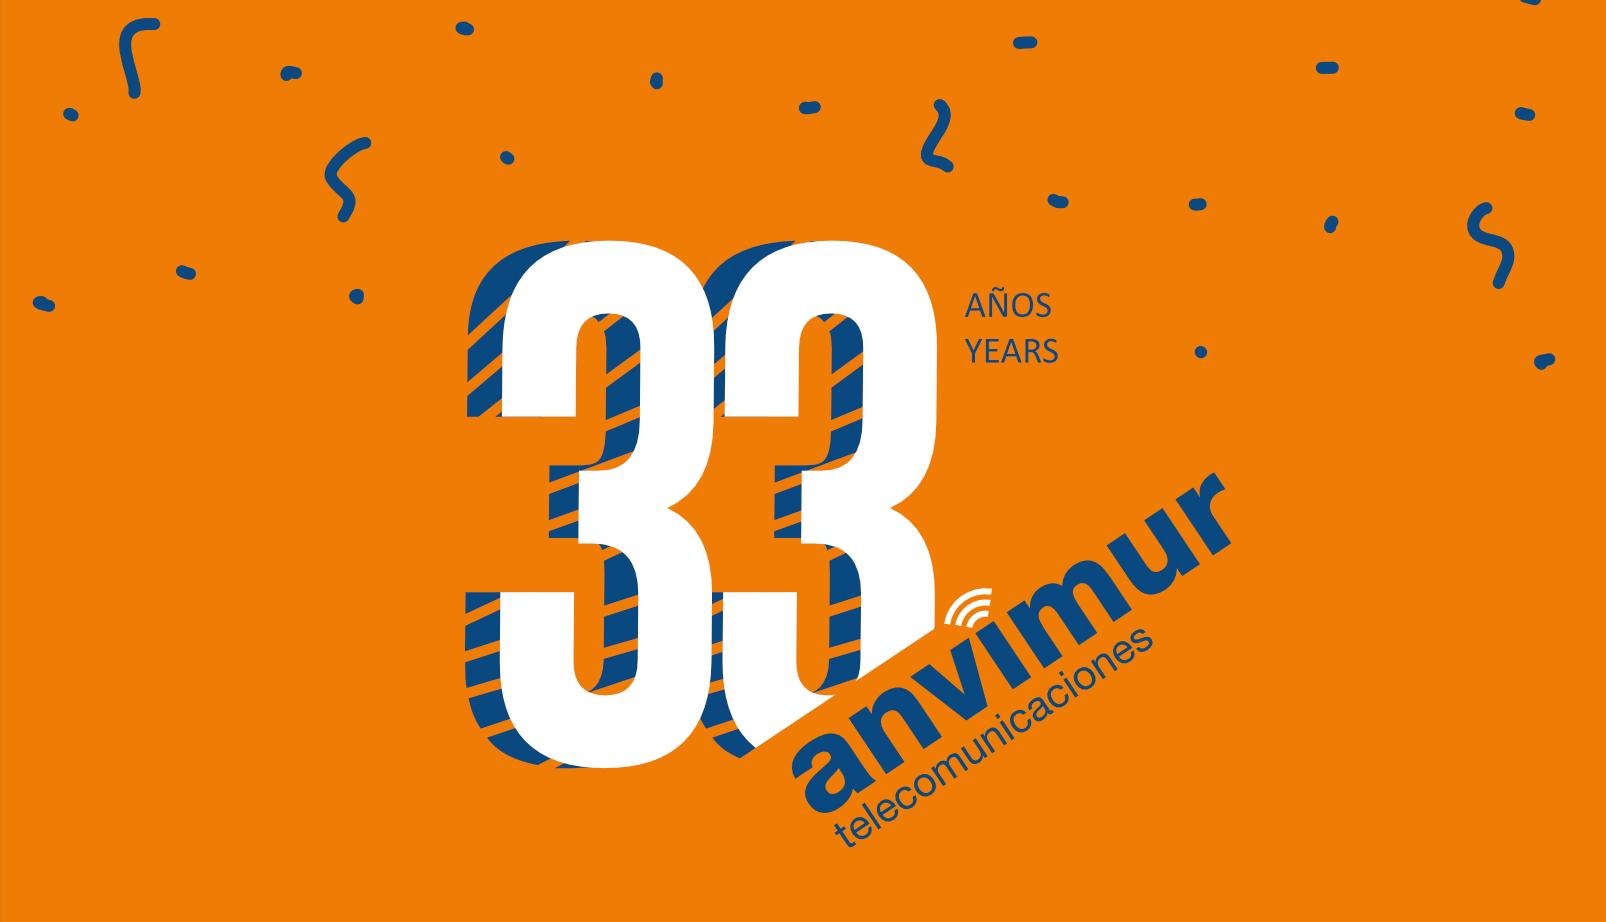 Aniversario Anvimur Telecomunicaciones